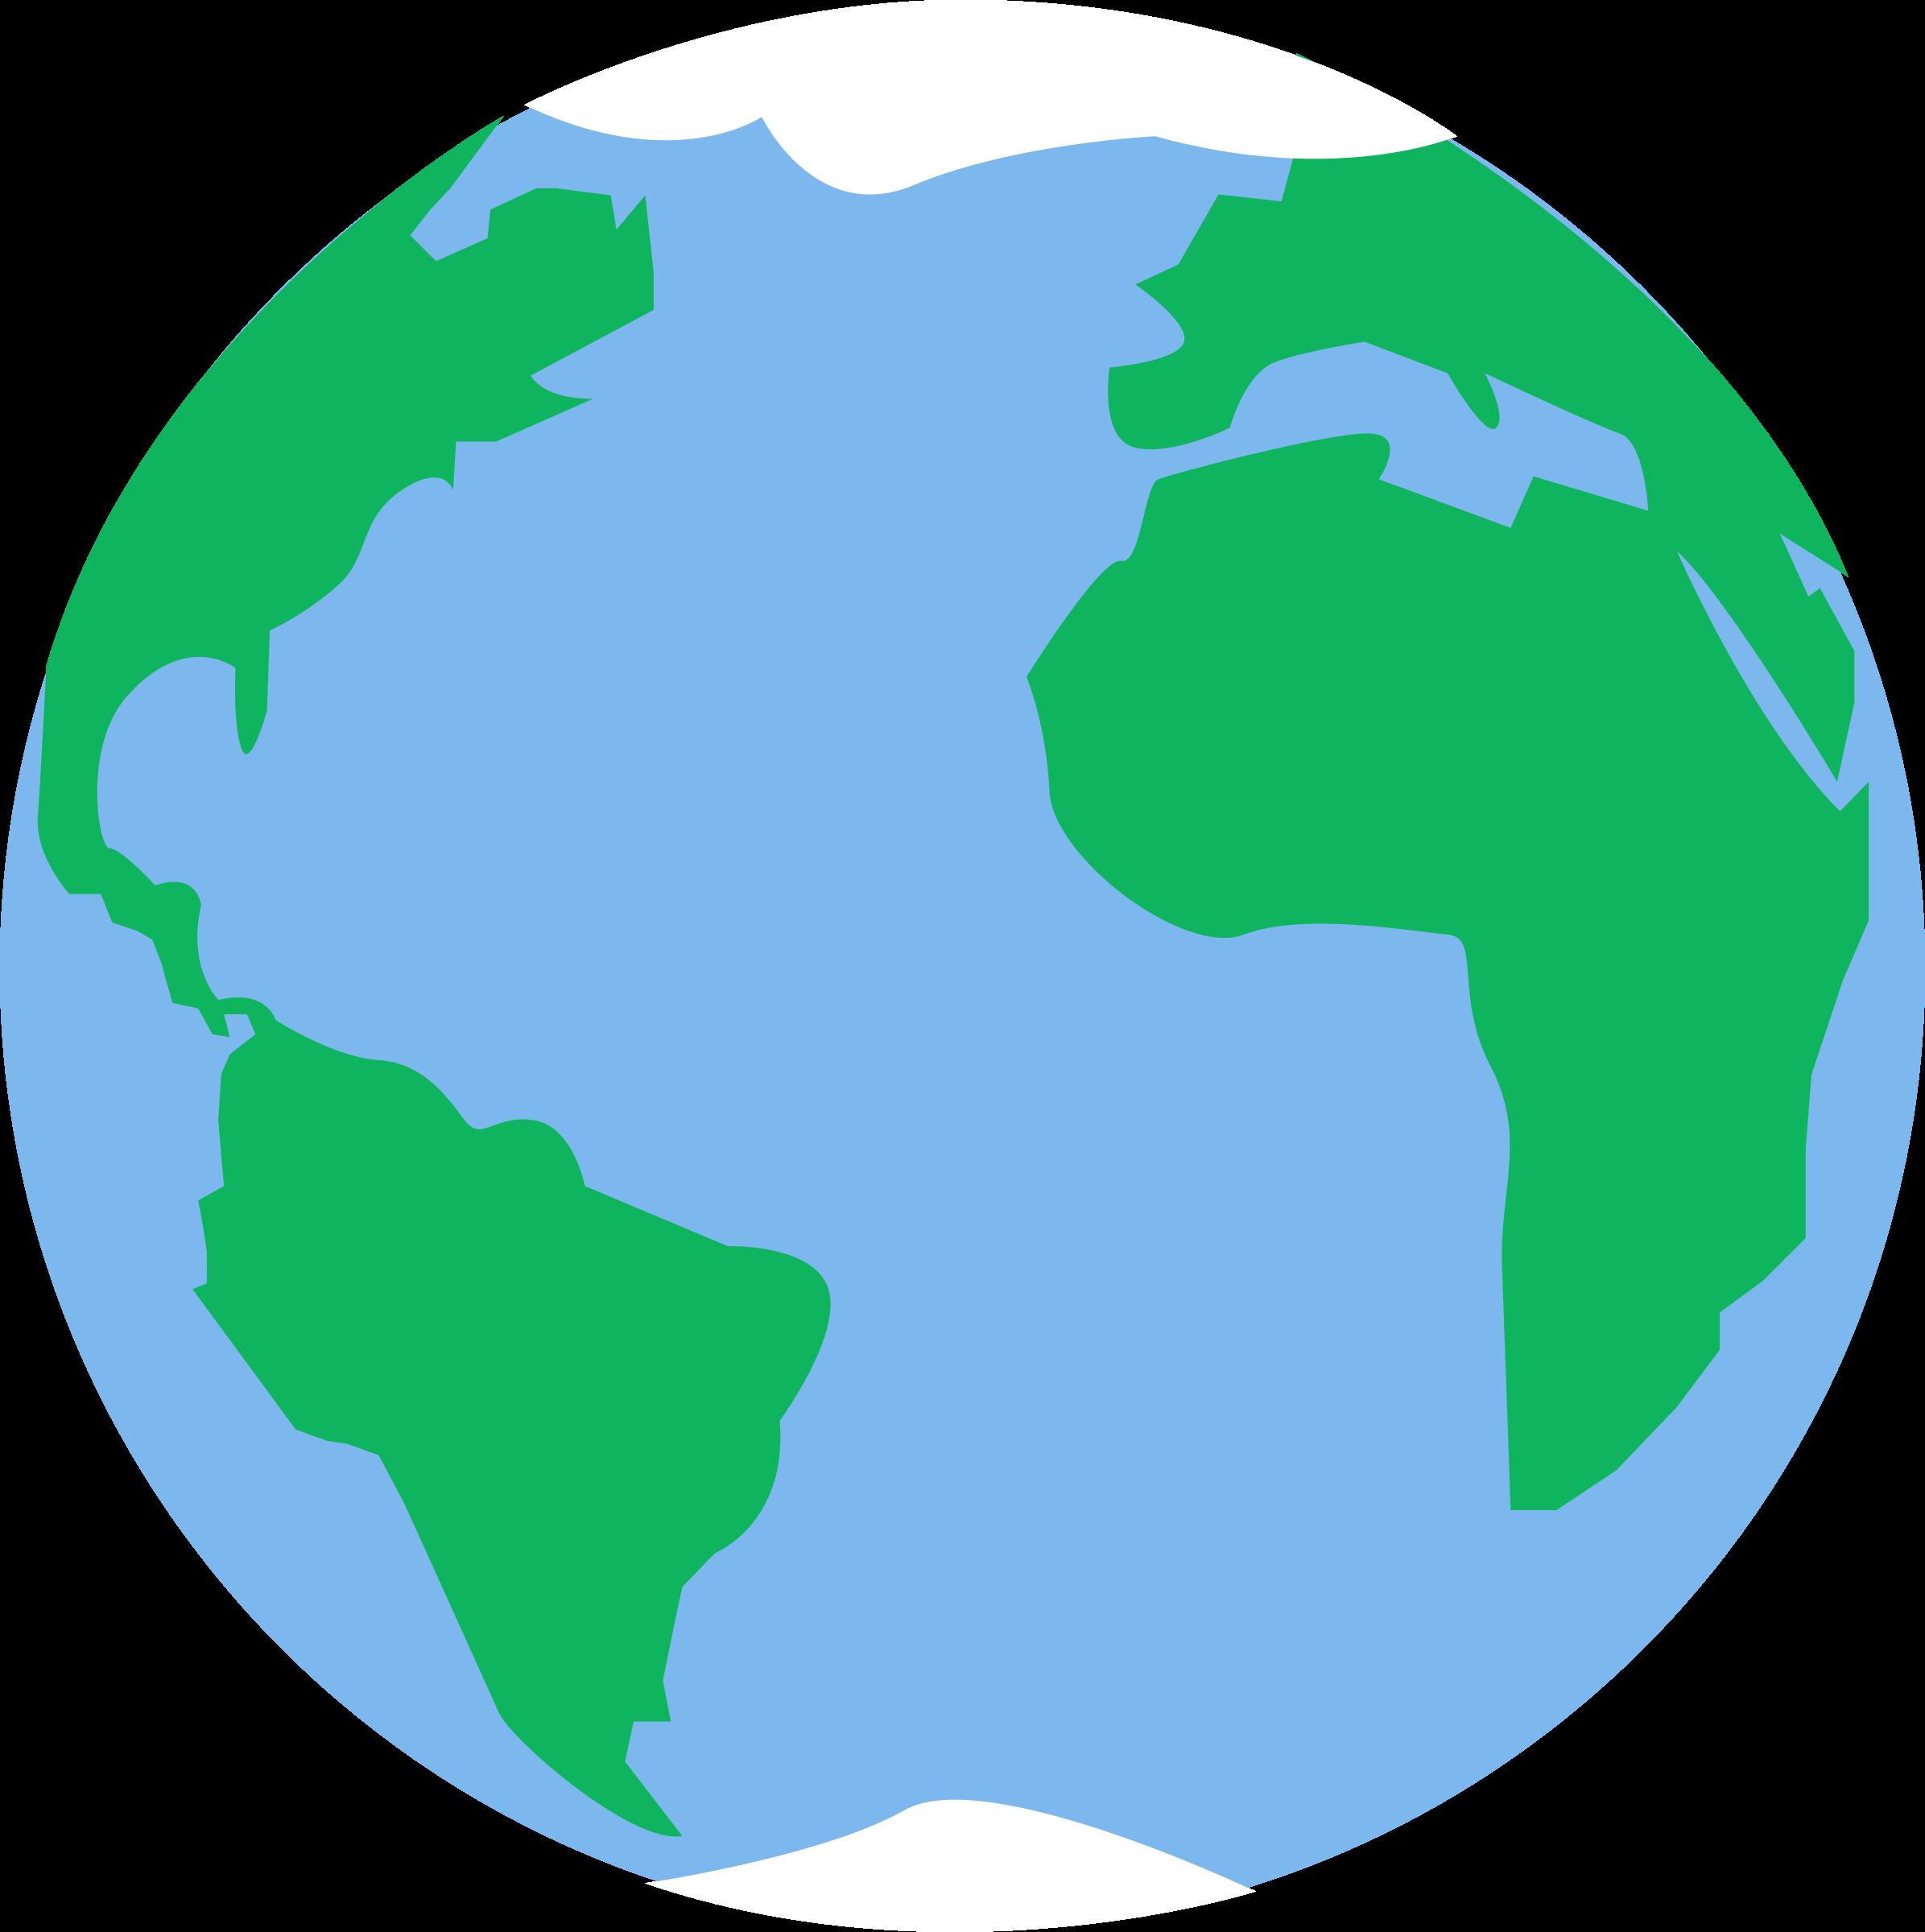 Planet Earth Clip Art.